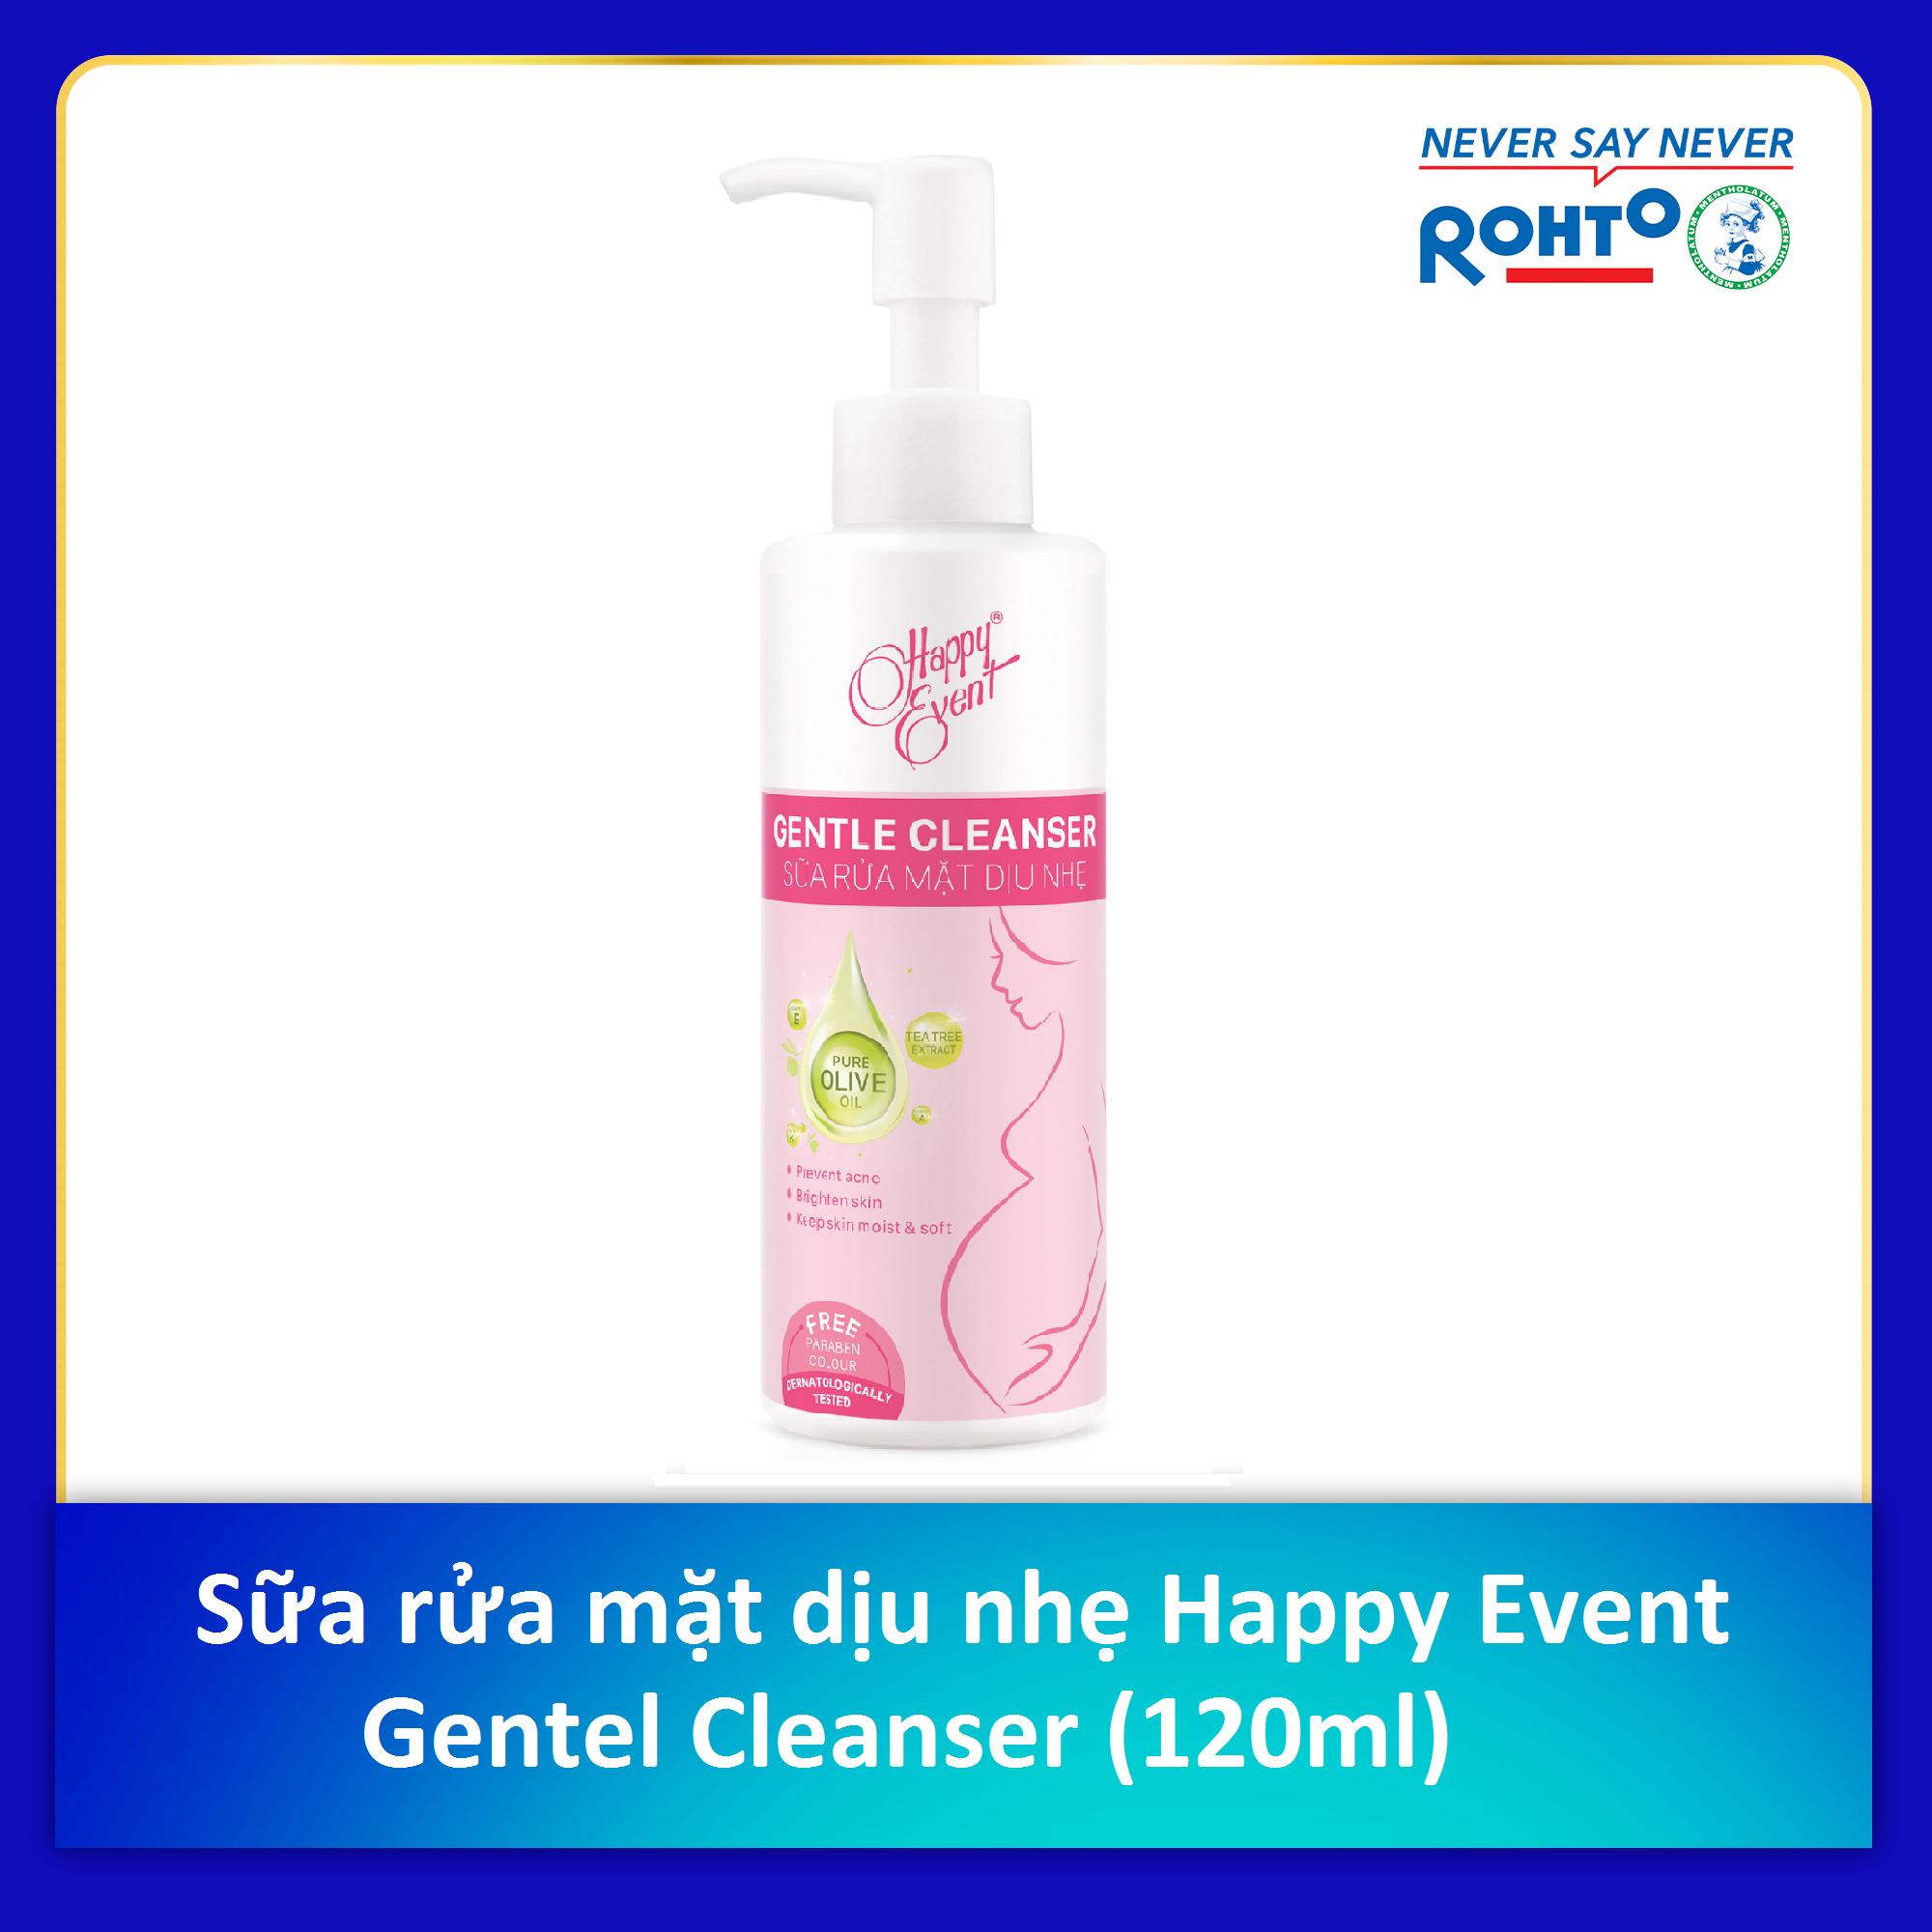 Sữa rửa mặt dịu nhẹ Happy Event Gentle Cleanser 120ml